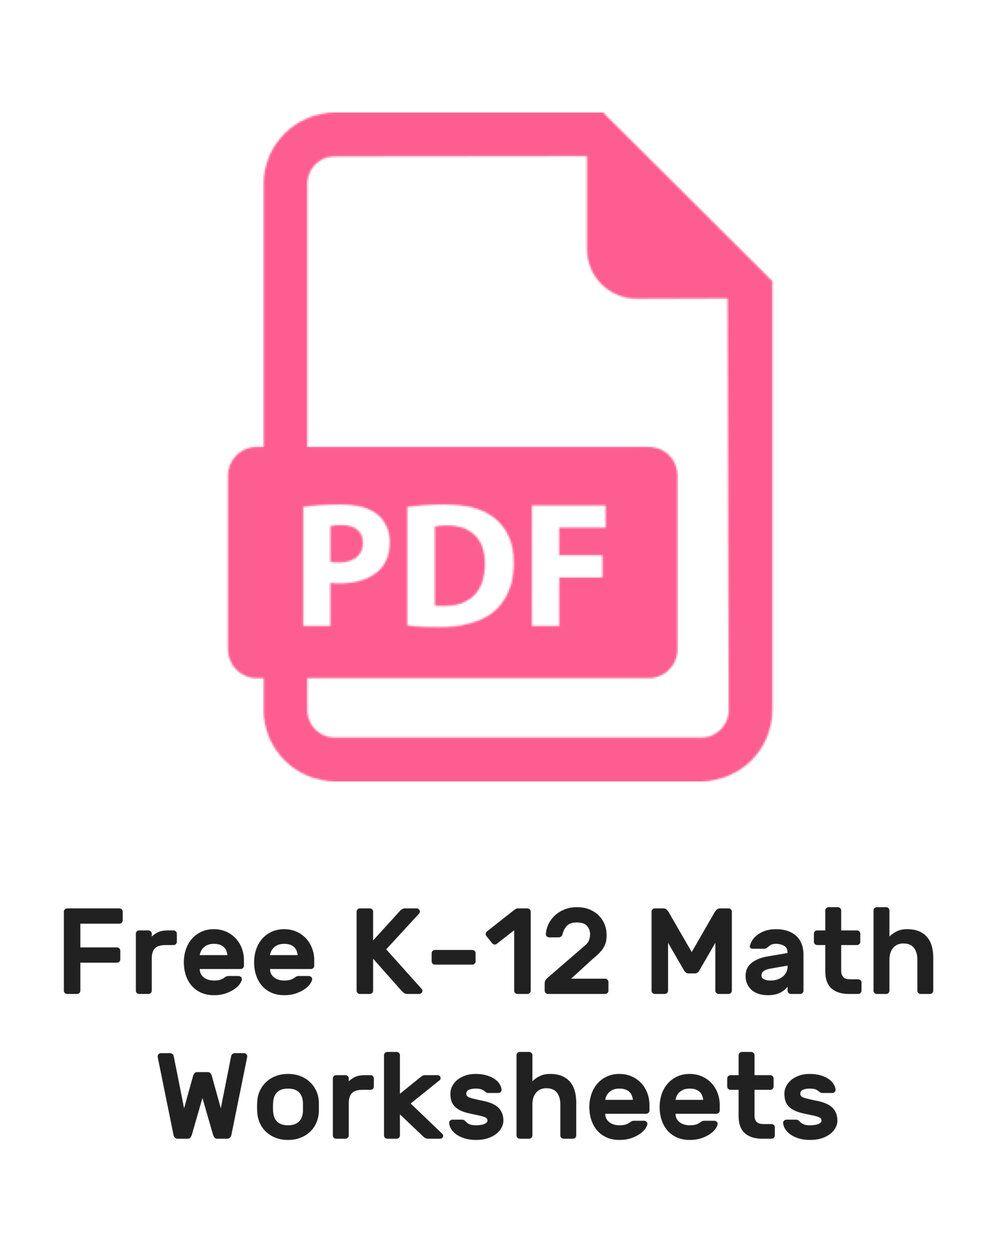 The Best Free First Grade Math Resources Complete List Mashup Math In 2021 2nd Grade Math 9th Grade Math 2nd Grade Math Worksheets [ 1250 x 1000 Pixel ]